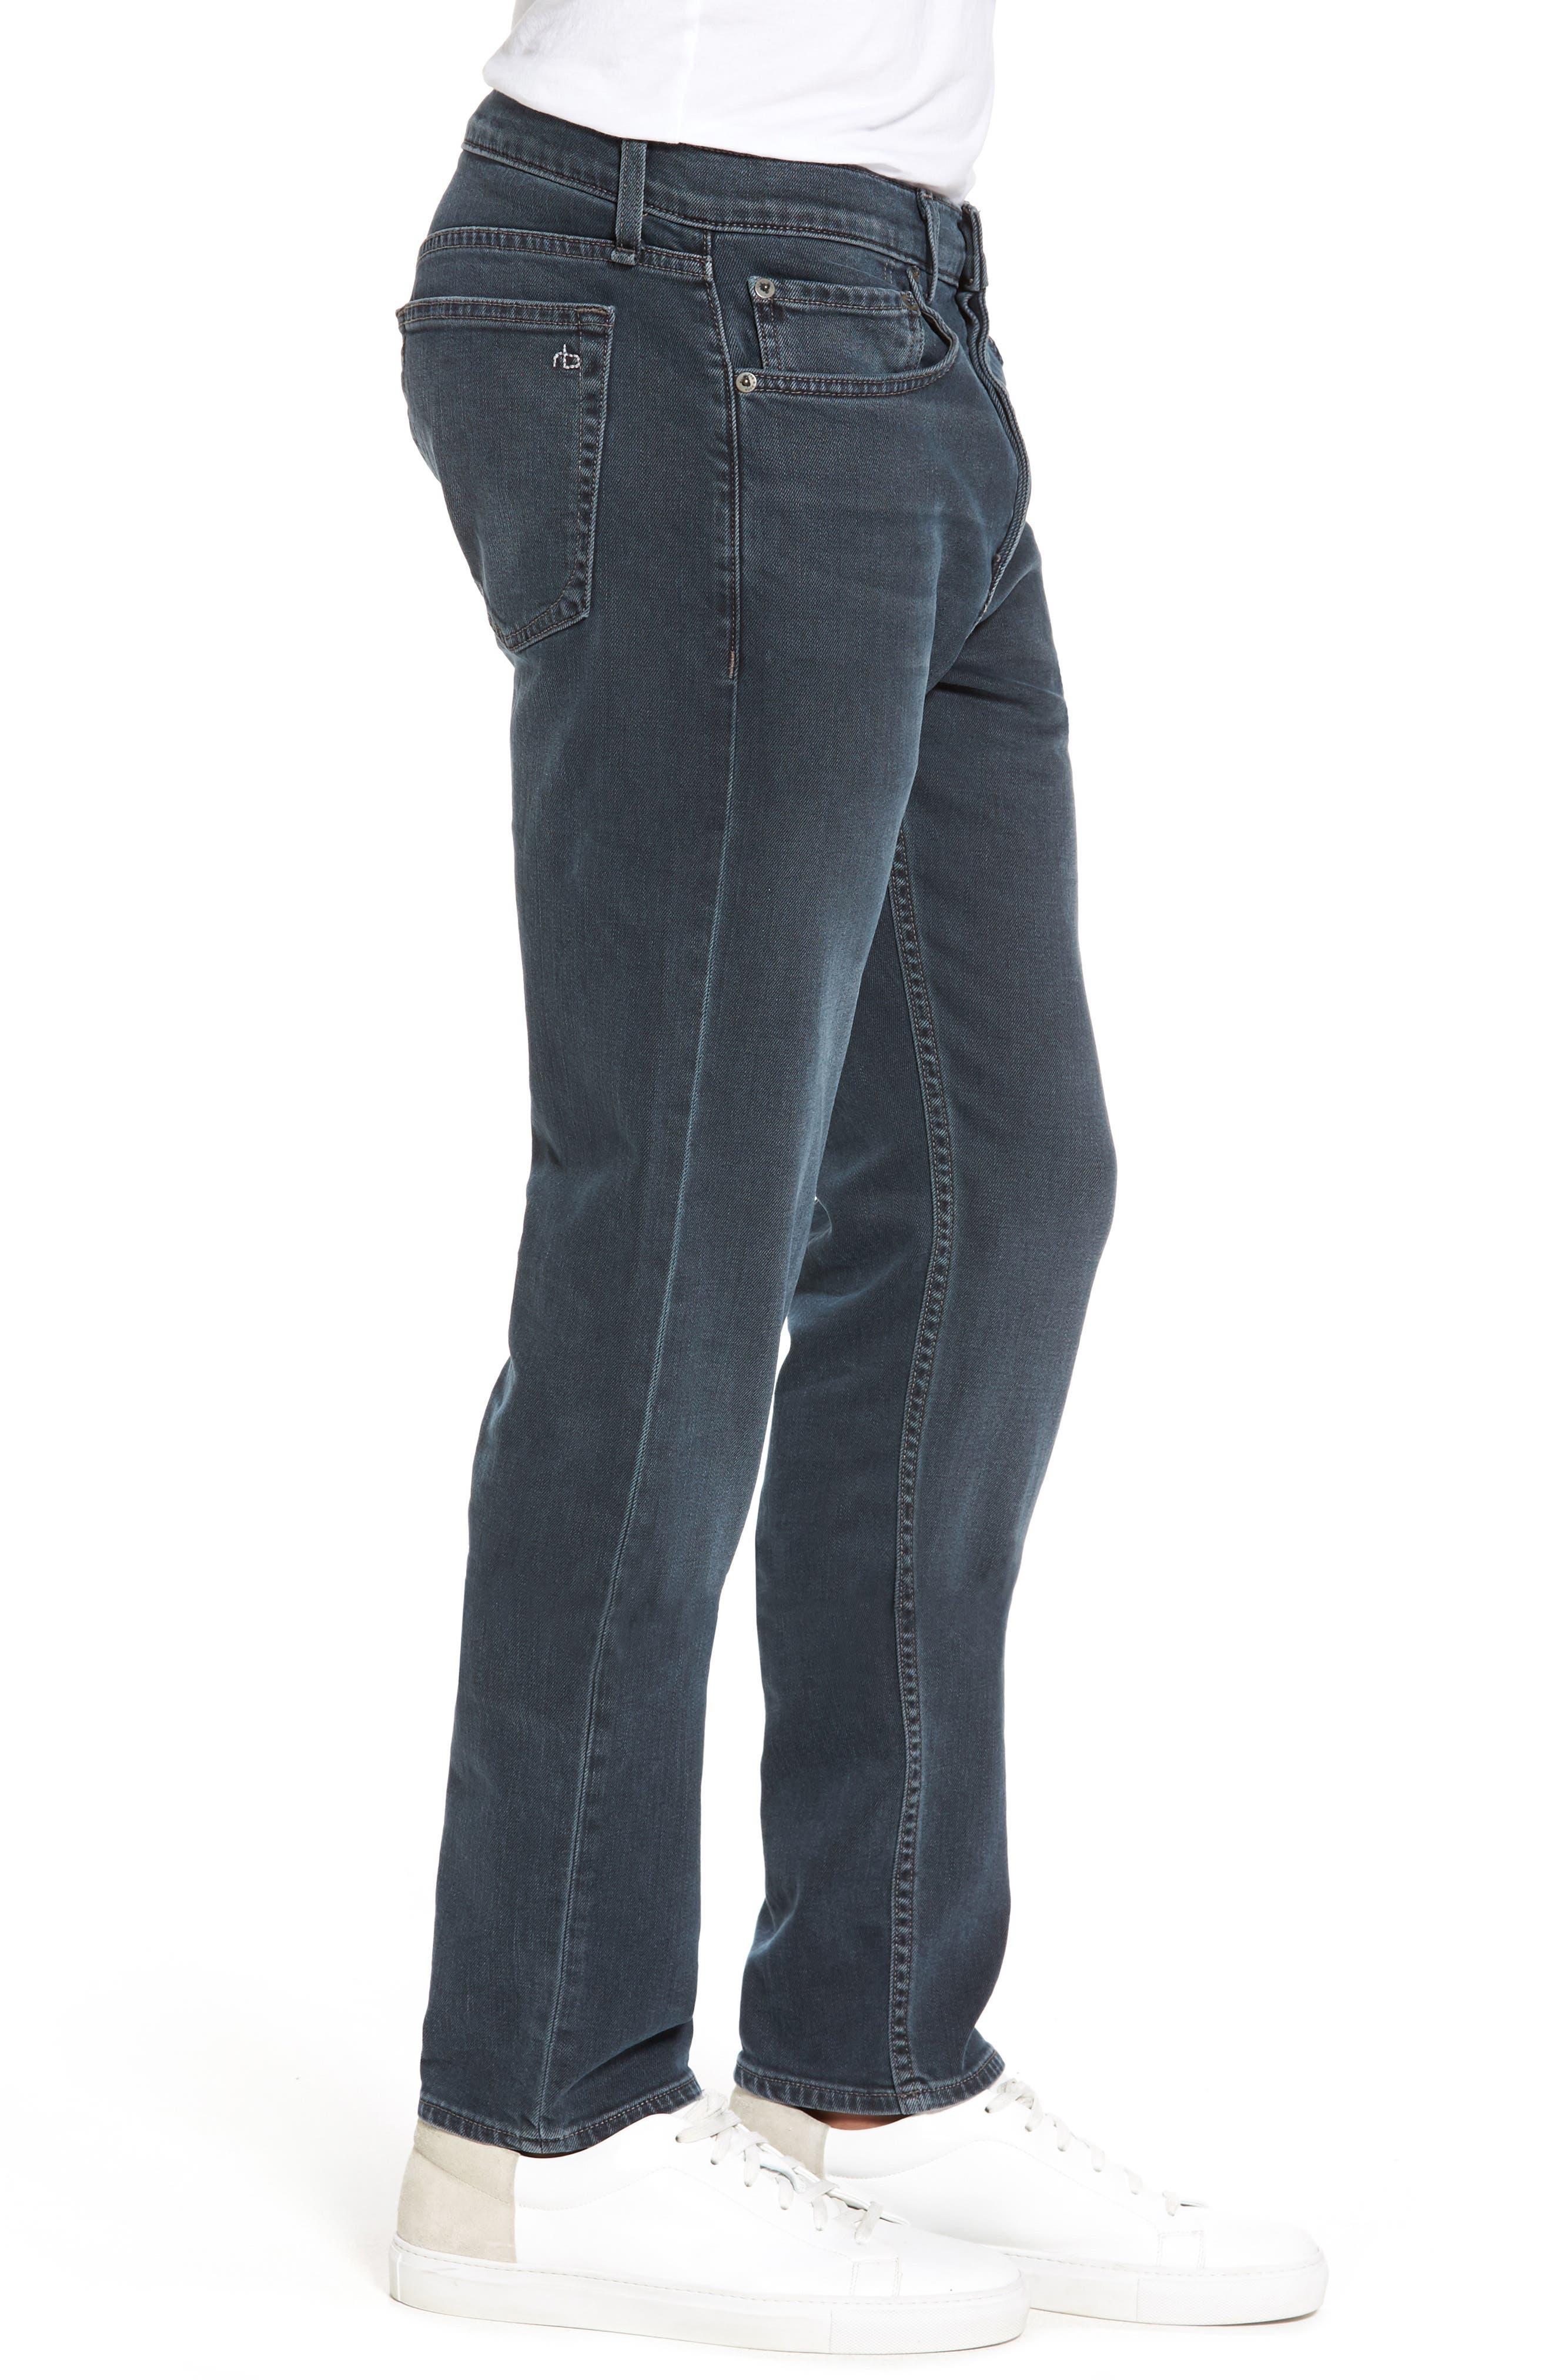 RAG & BONE, Fit 2 Slim Fit Jeans, Alternate thumbnail 4, color, MINNA